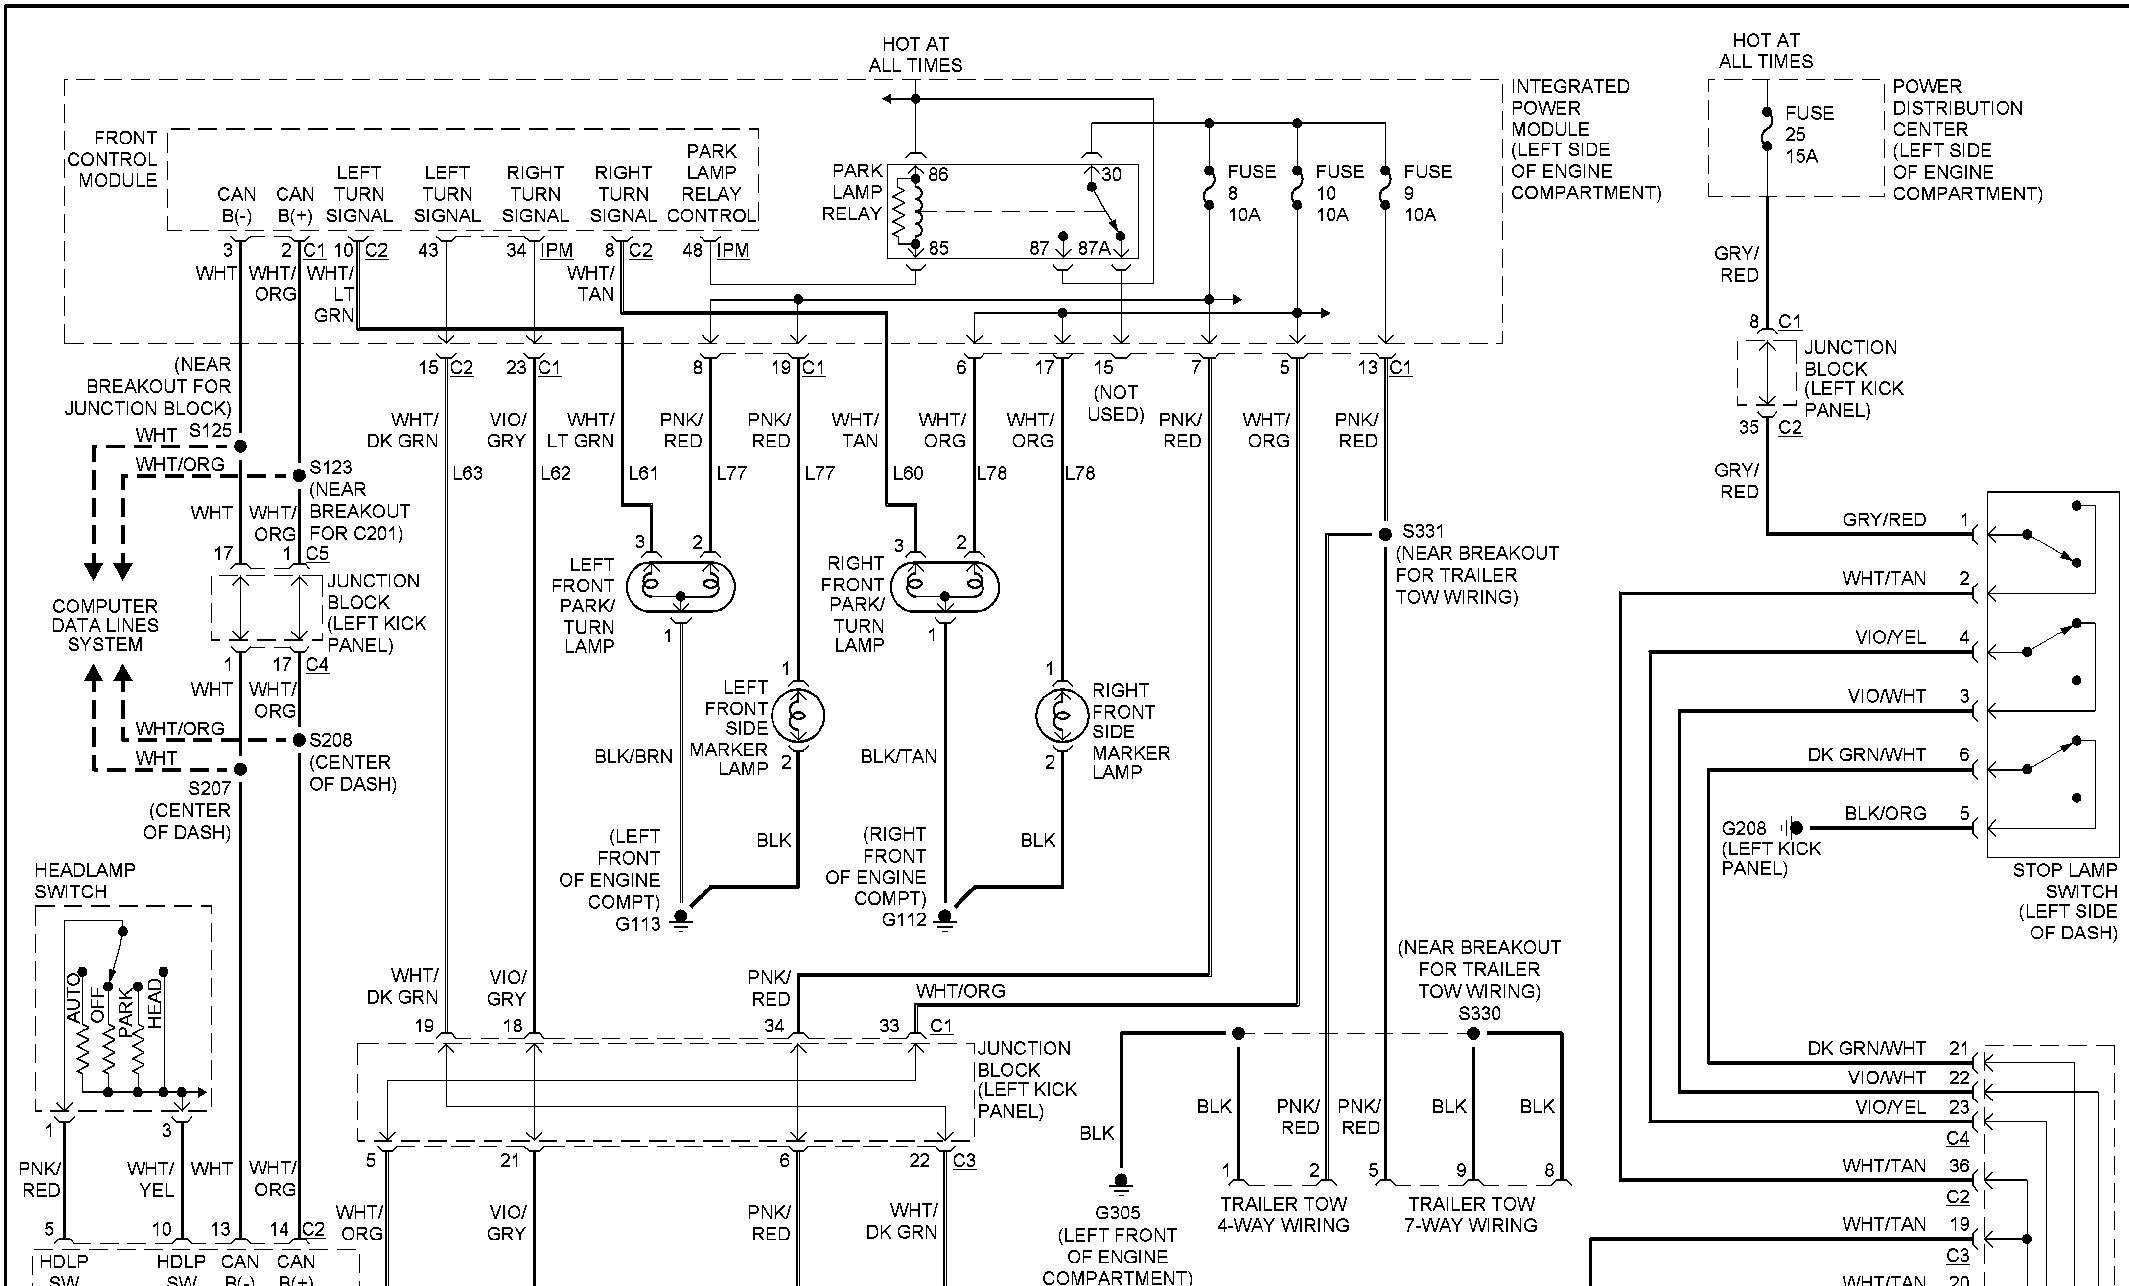 2004 Dodge Durango Trailer Wiring Diagram